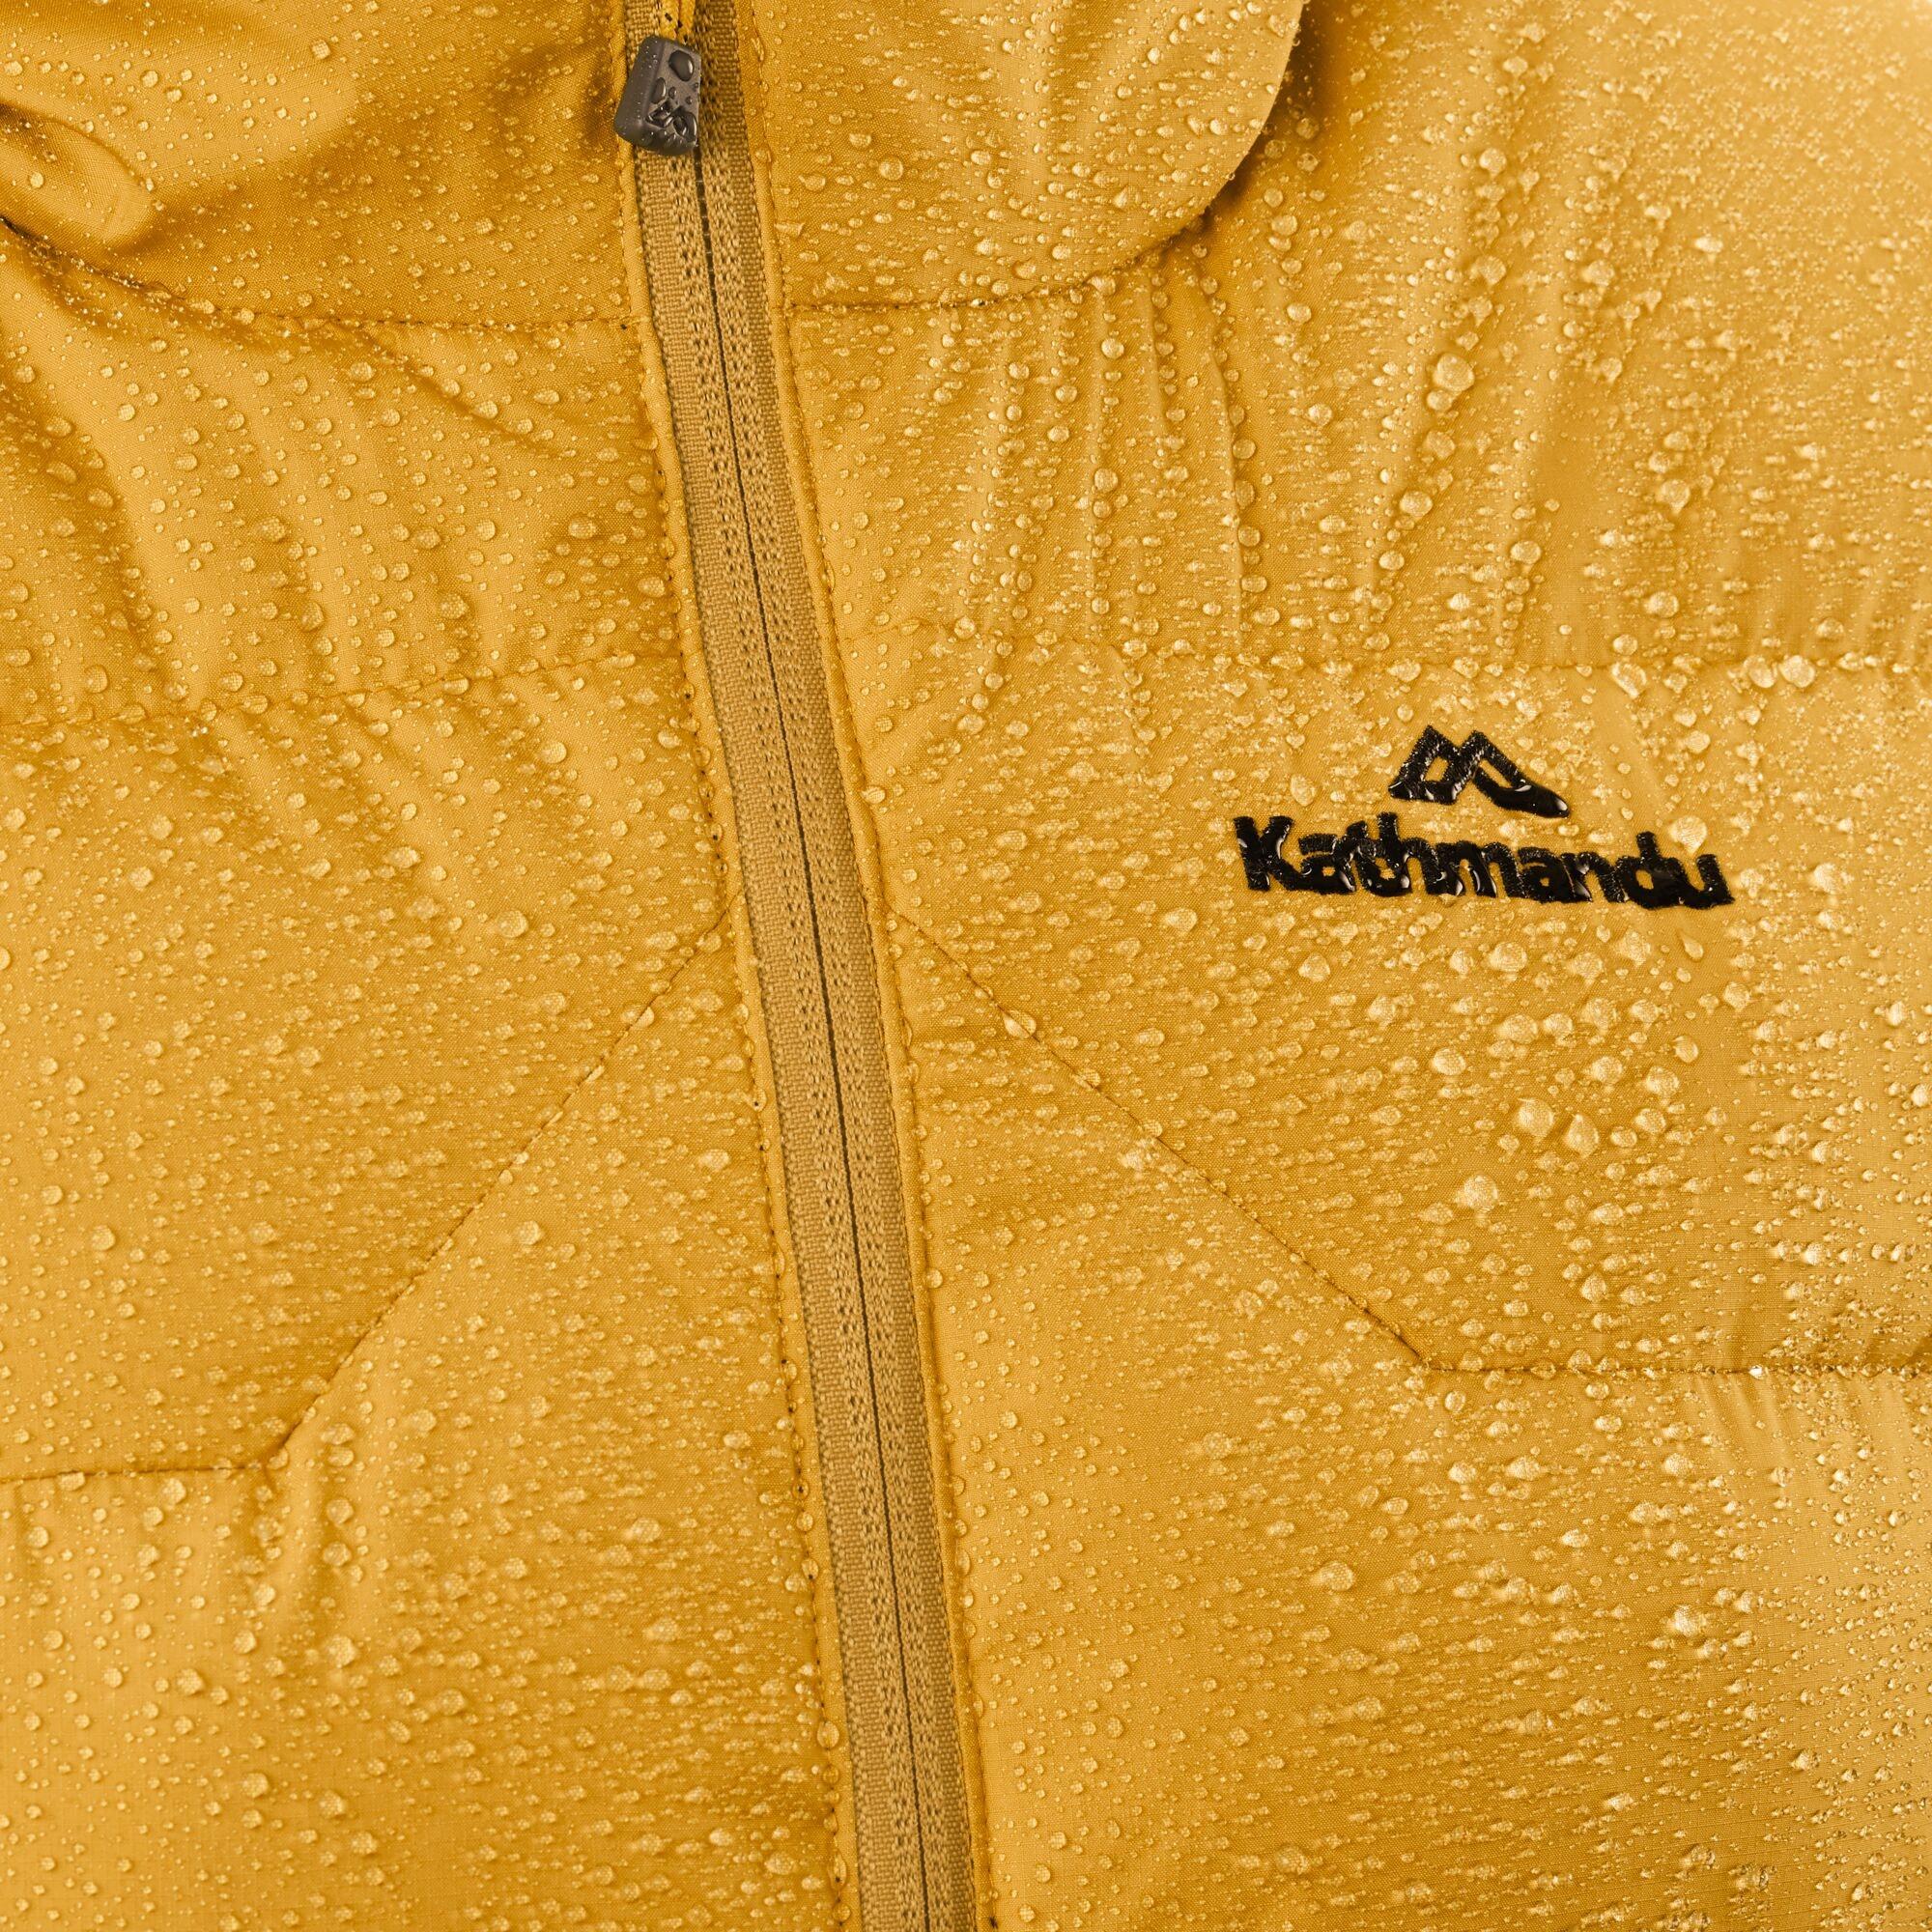 thumbnail 51 - NEW Kathmandu Epiq Womens Hooded Down Puffer 600 Fill Warm Outdoor Winter Jacket